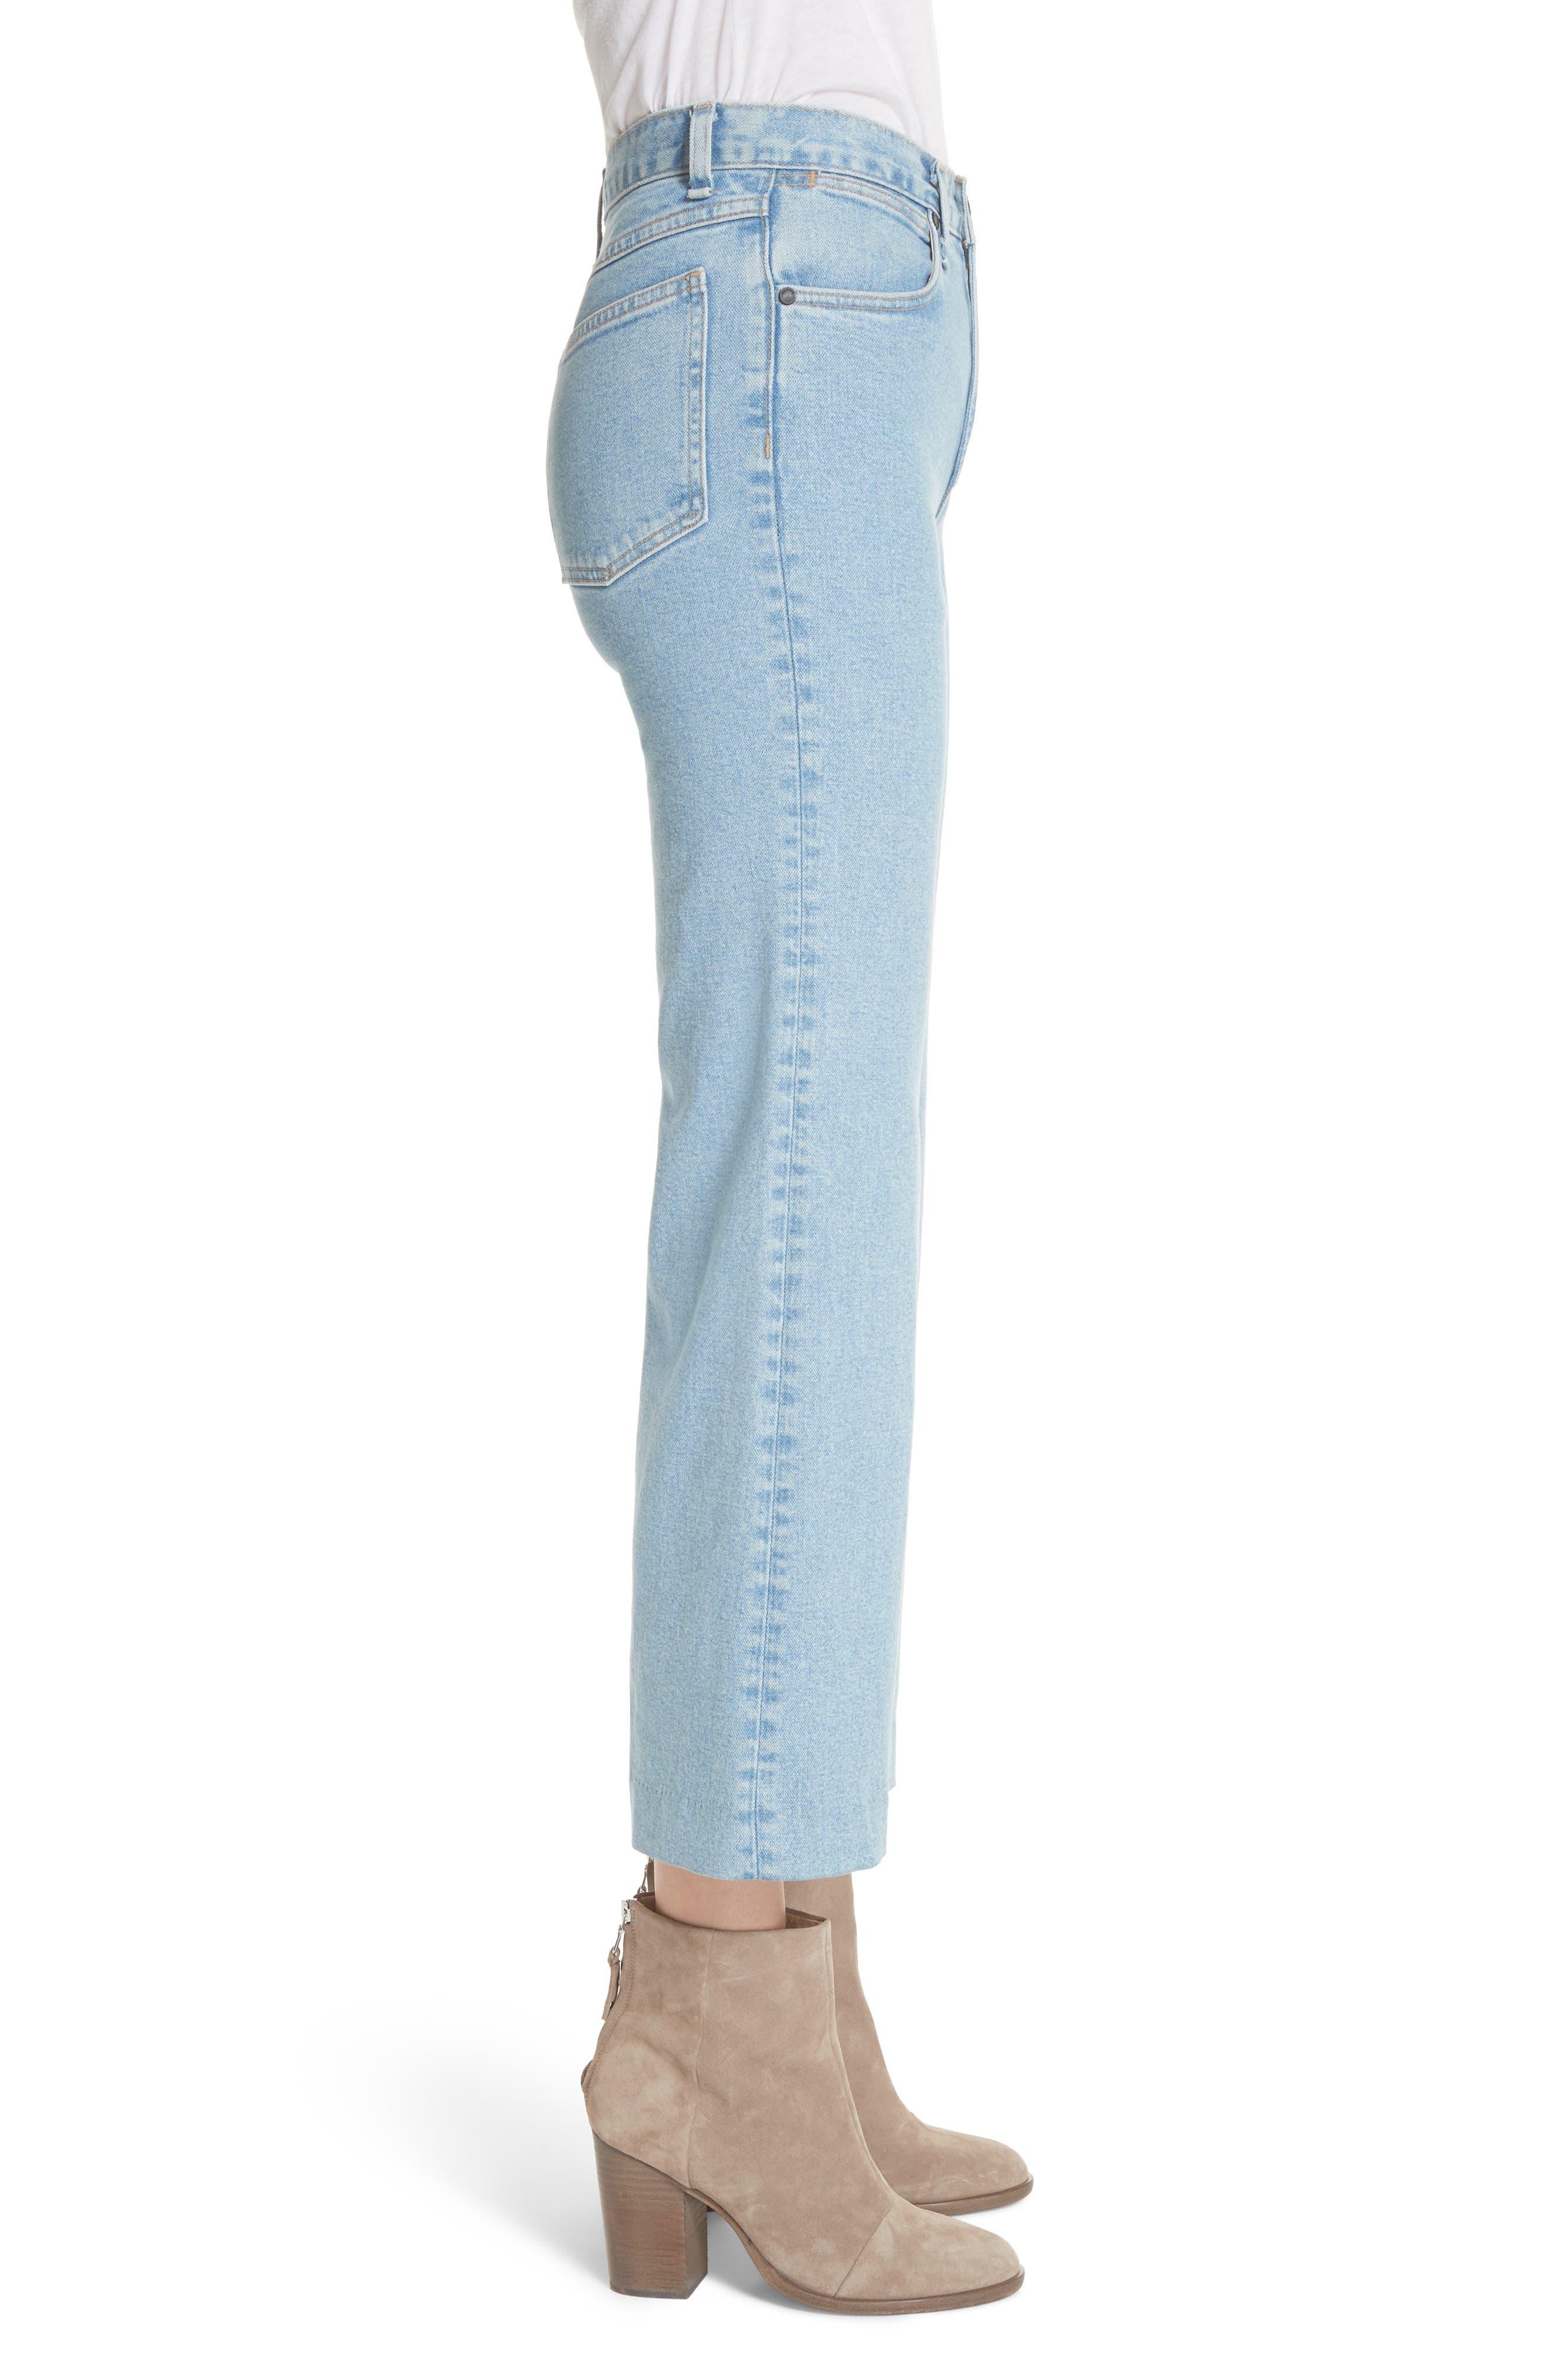 Justine High Waist Wide Leg Trouser Jeans,                             Alternate thumbnail 3, color,                             Broken Nelly